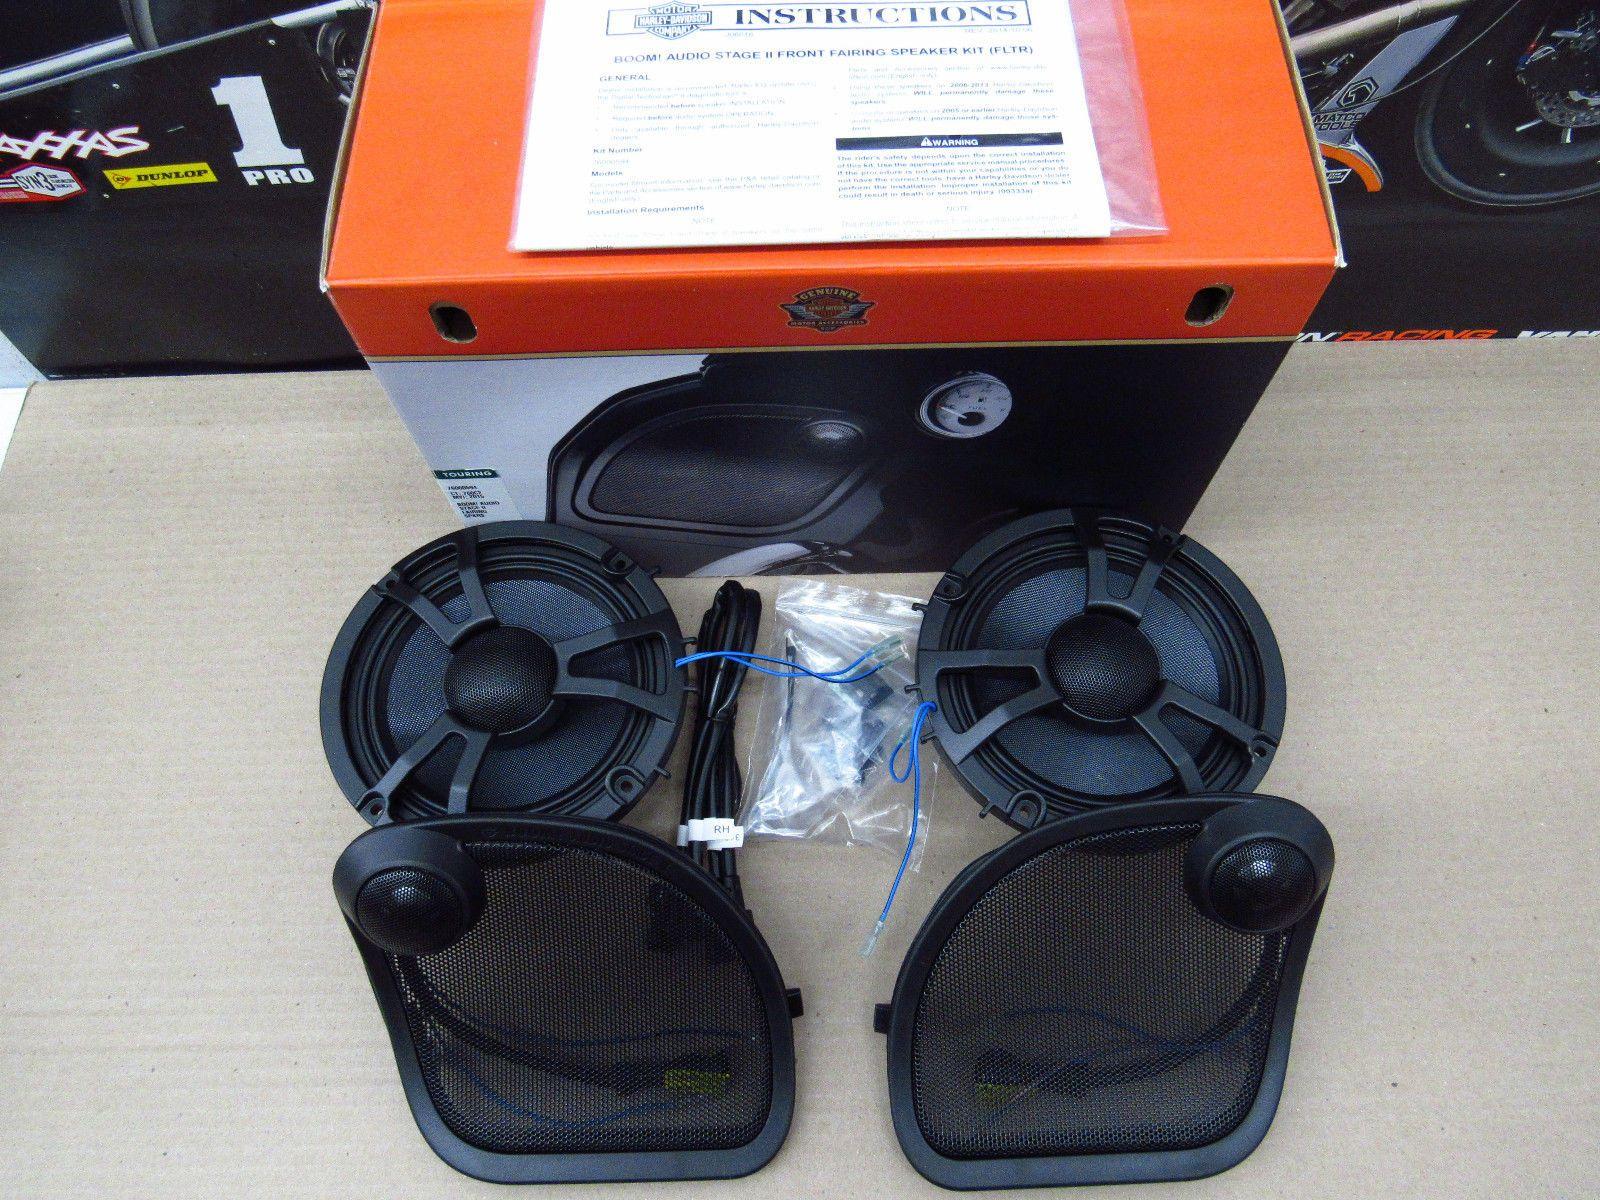 Harley Davidson Boom Audio Stage 2 Fairing Speaker Kit 76000594 Please Retweet